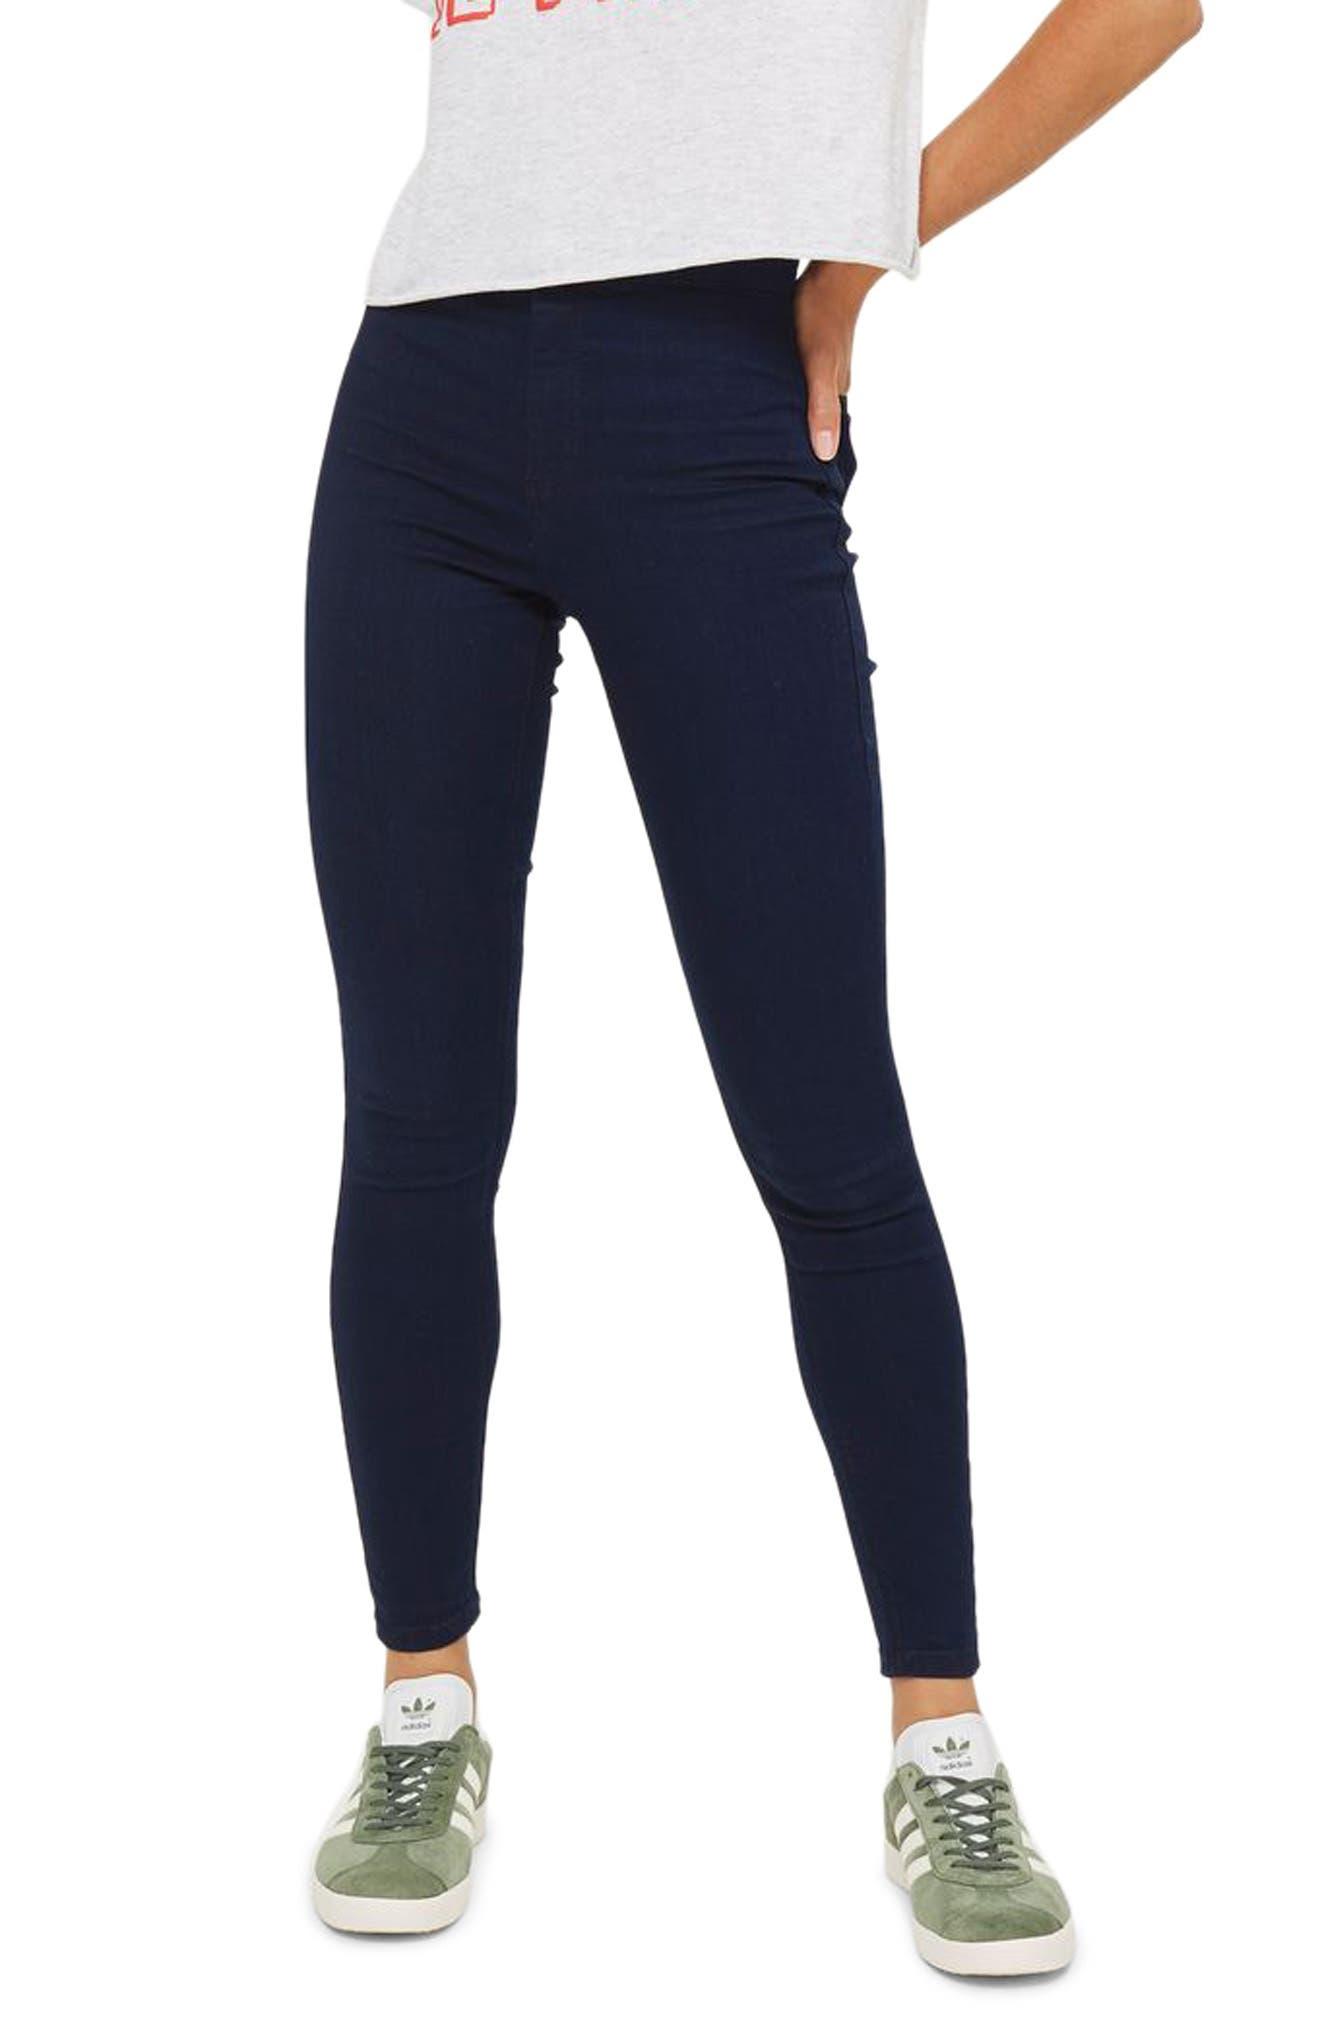 TOPSHOP, Joni High Waist Skinny Jeans, Main thumbnail 1, color, DARK INDIGO